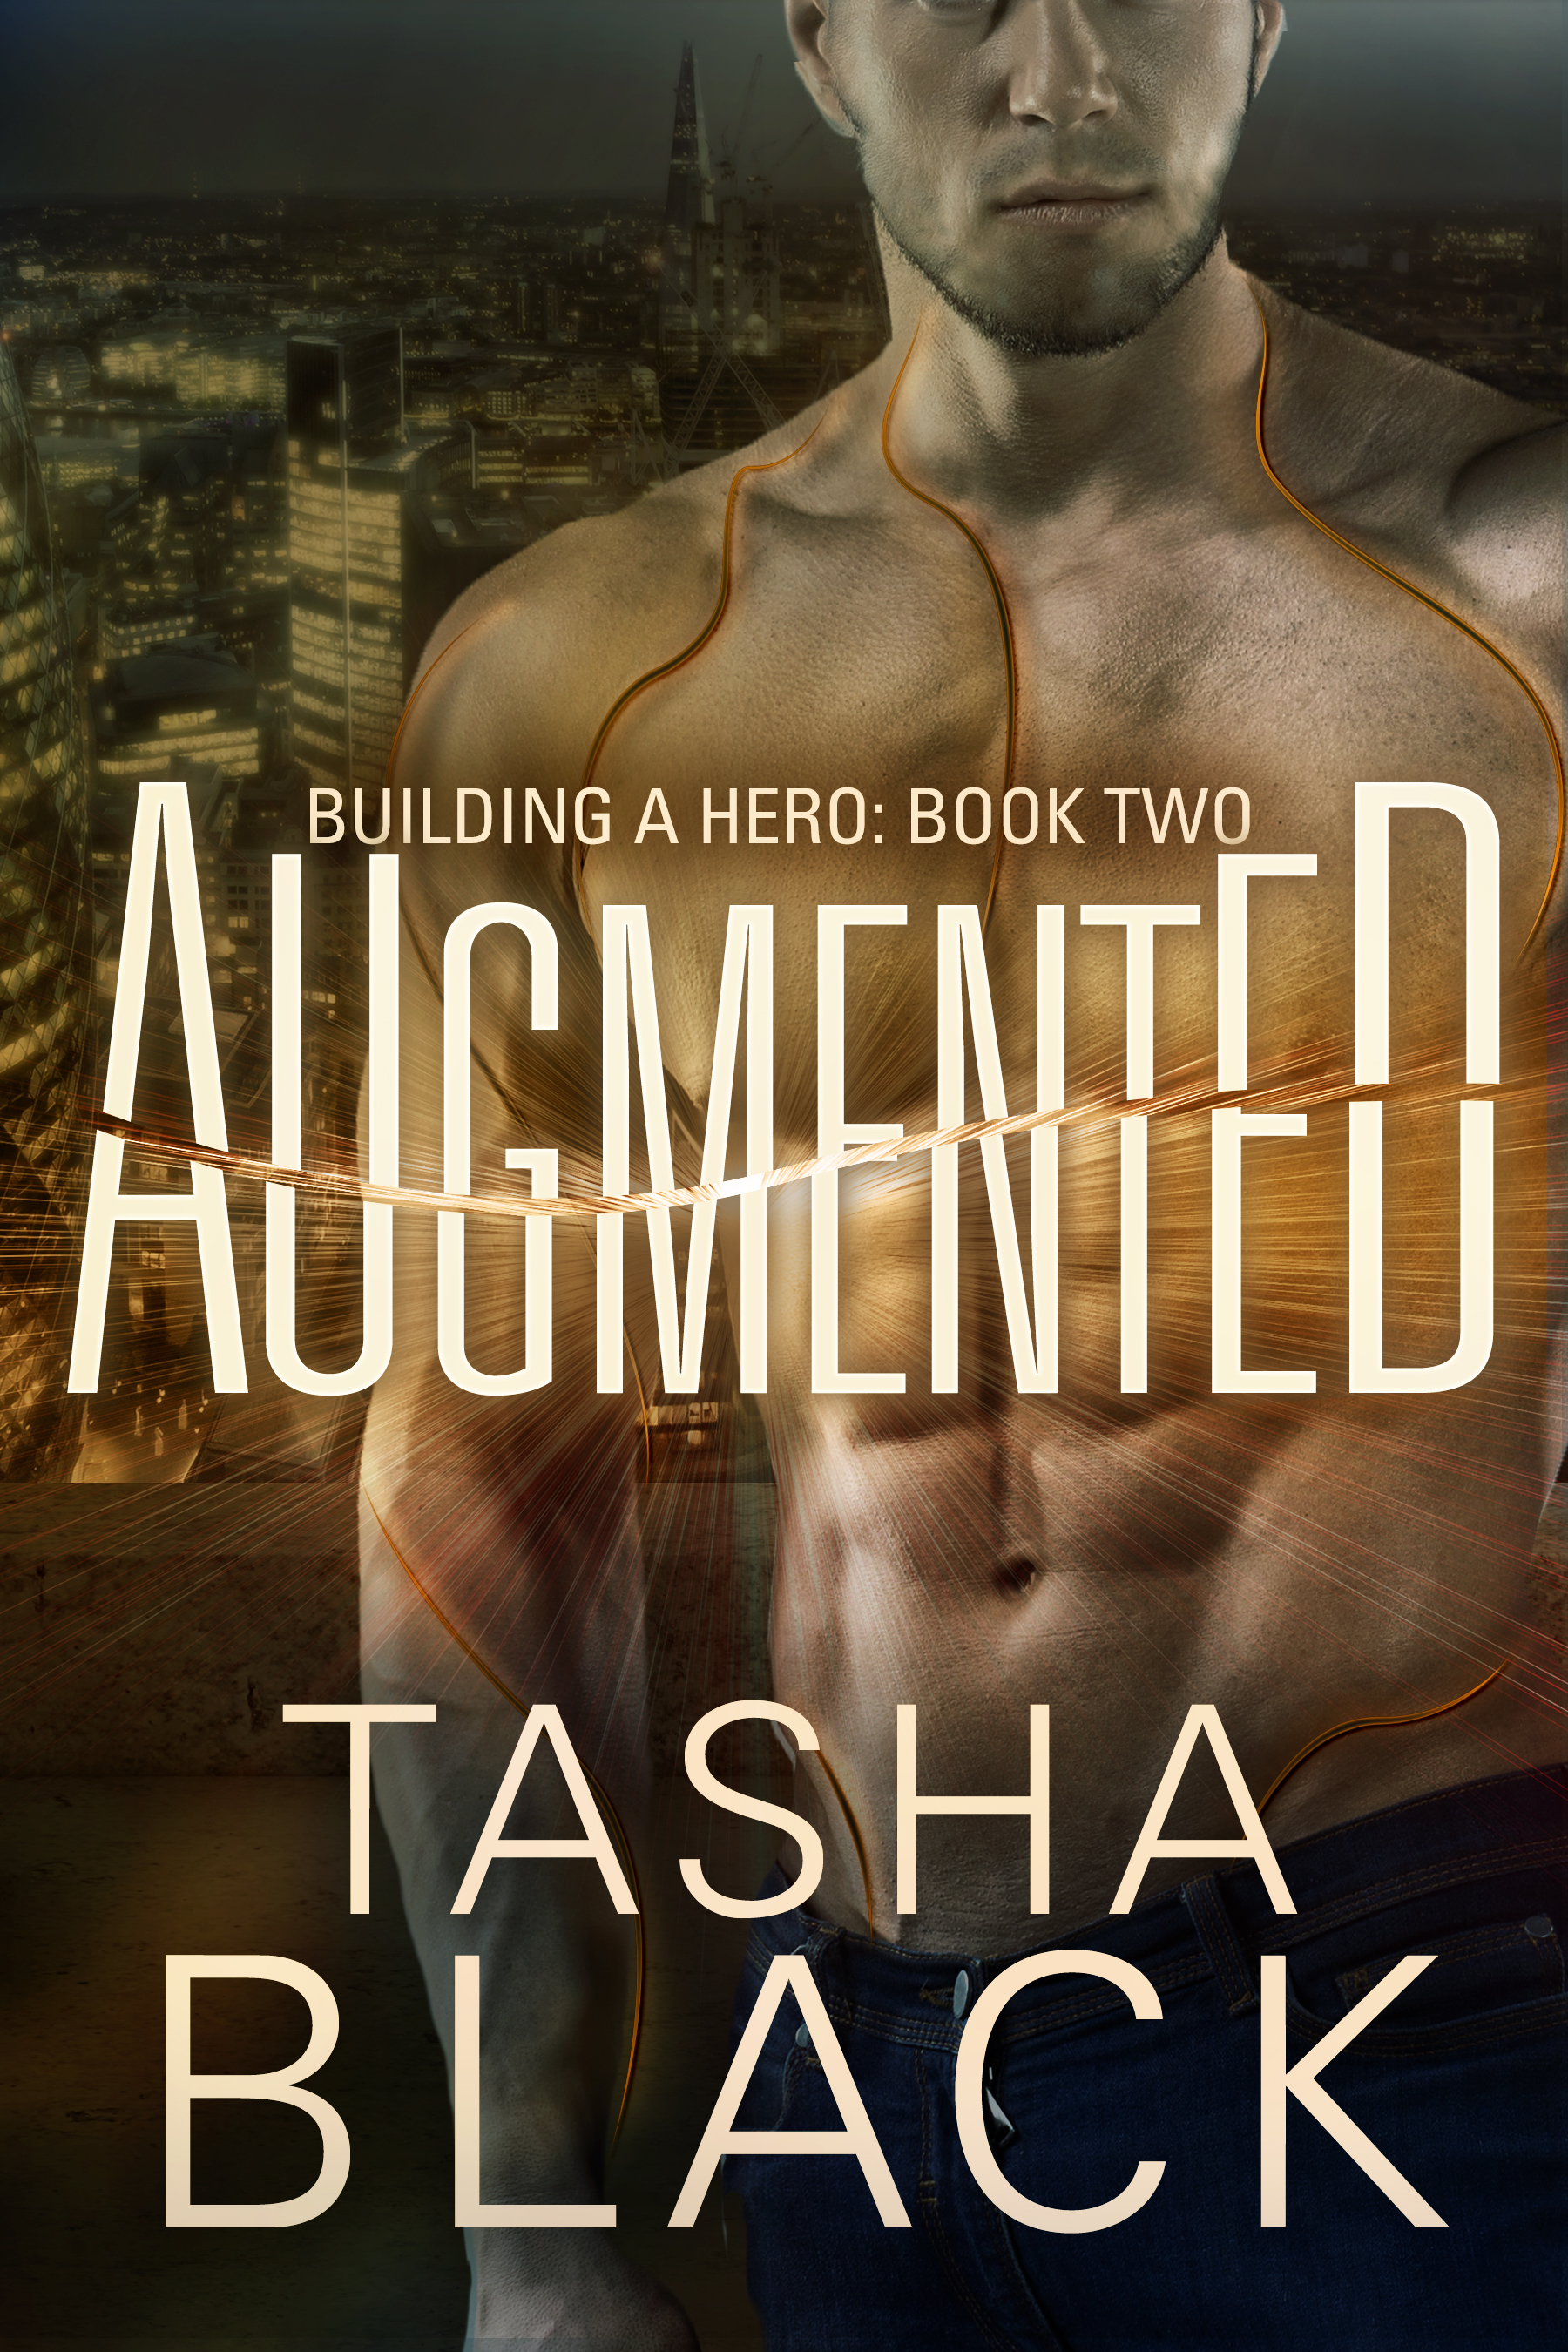 Augmented: building a hero (book 2)